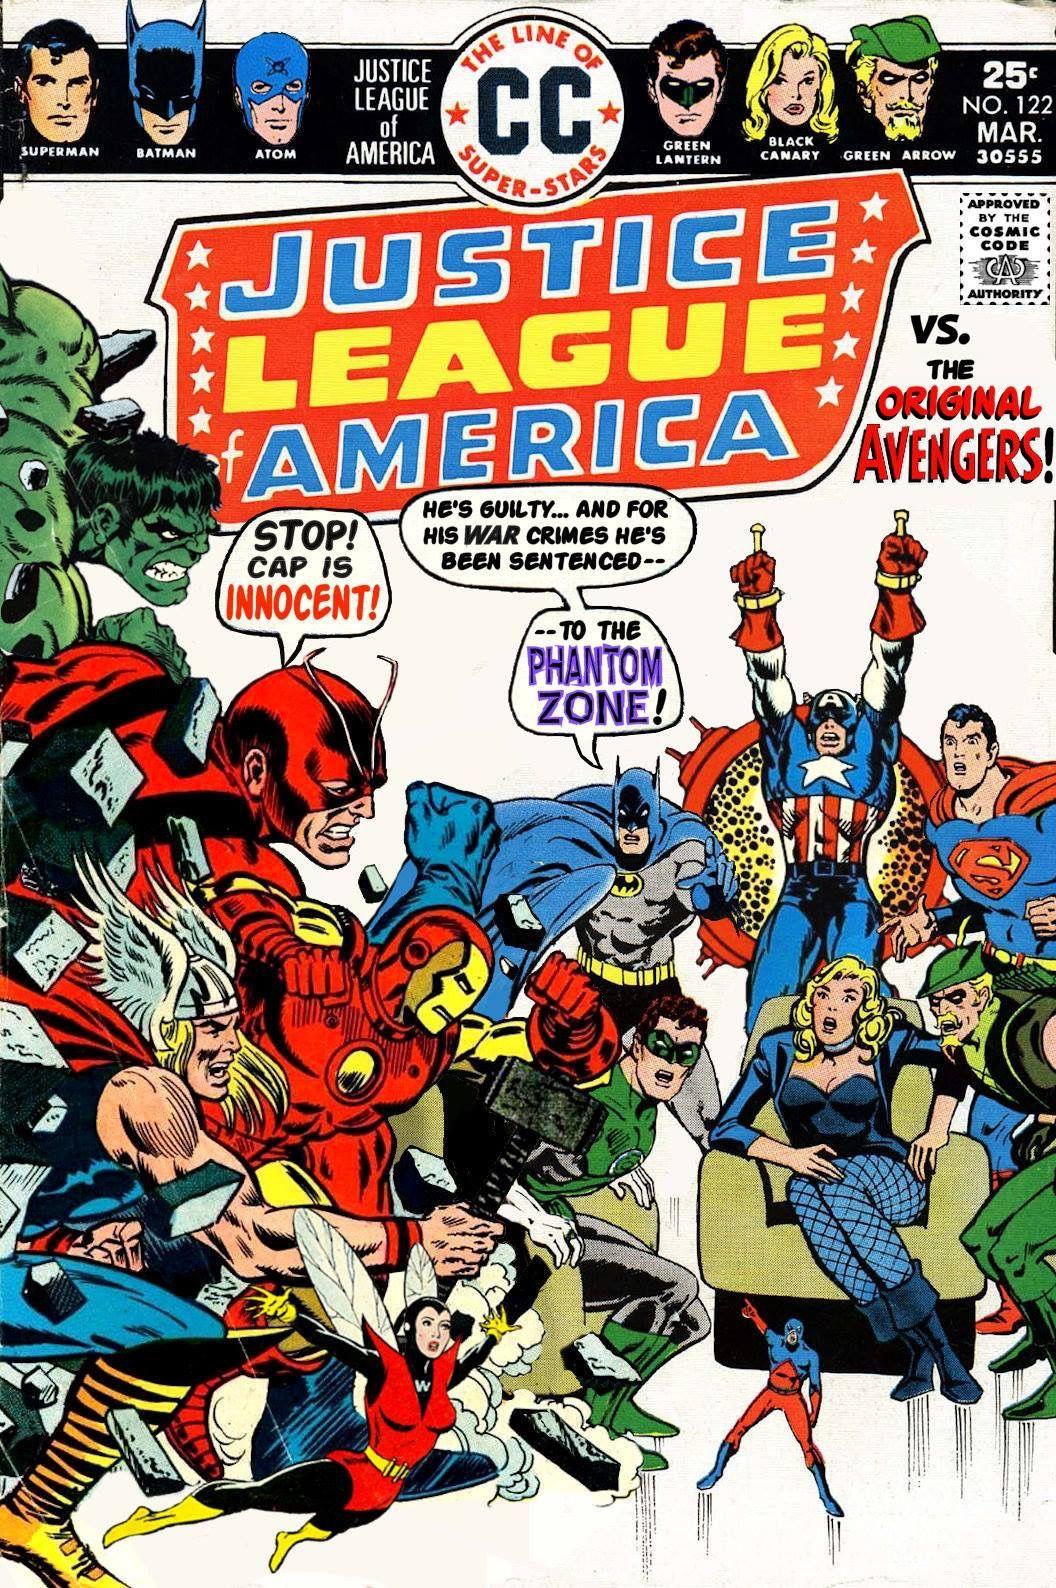 The Justice League Of America Vs The Original Avengers A Mock Cover Marvel Comics Superheroes Dc Comic Books Dc Comics Vs Marvel